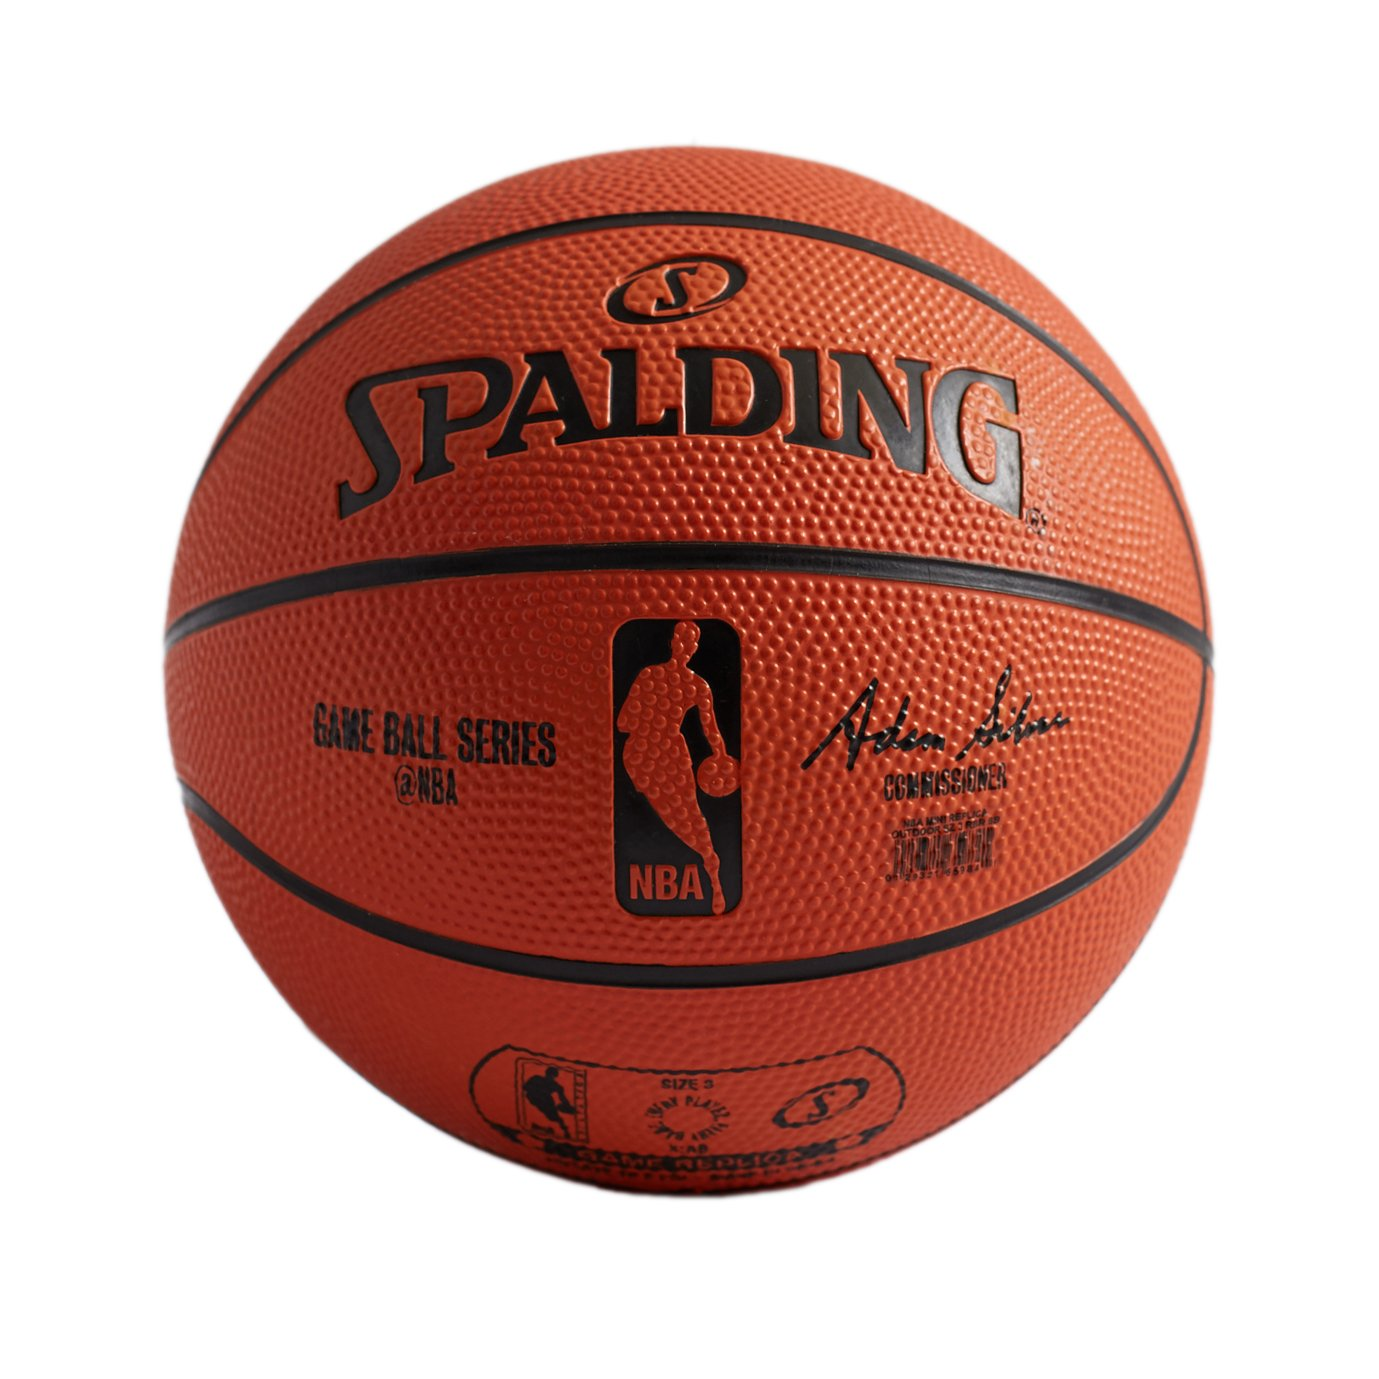 Spalding NBA Mini Replica Game Ball by Spalding